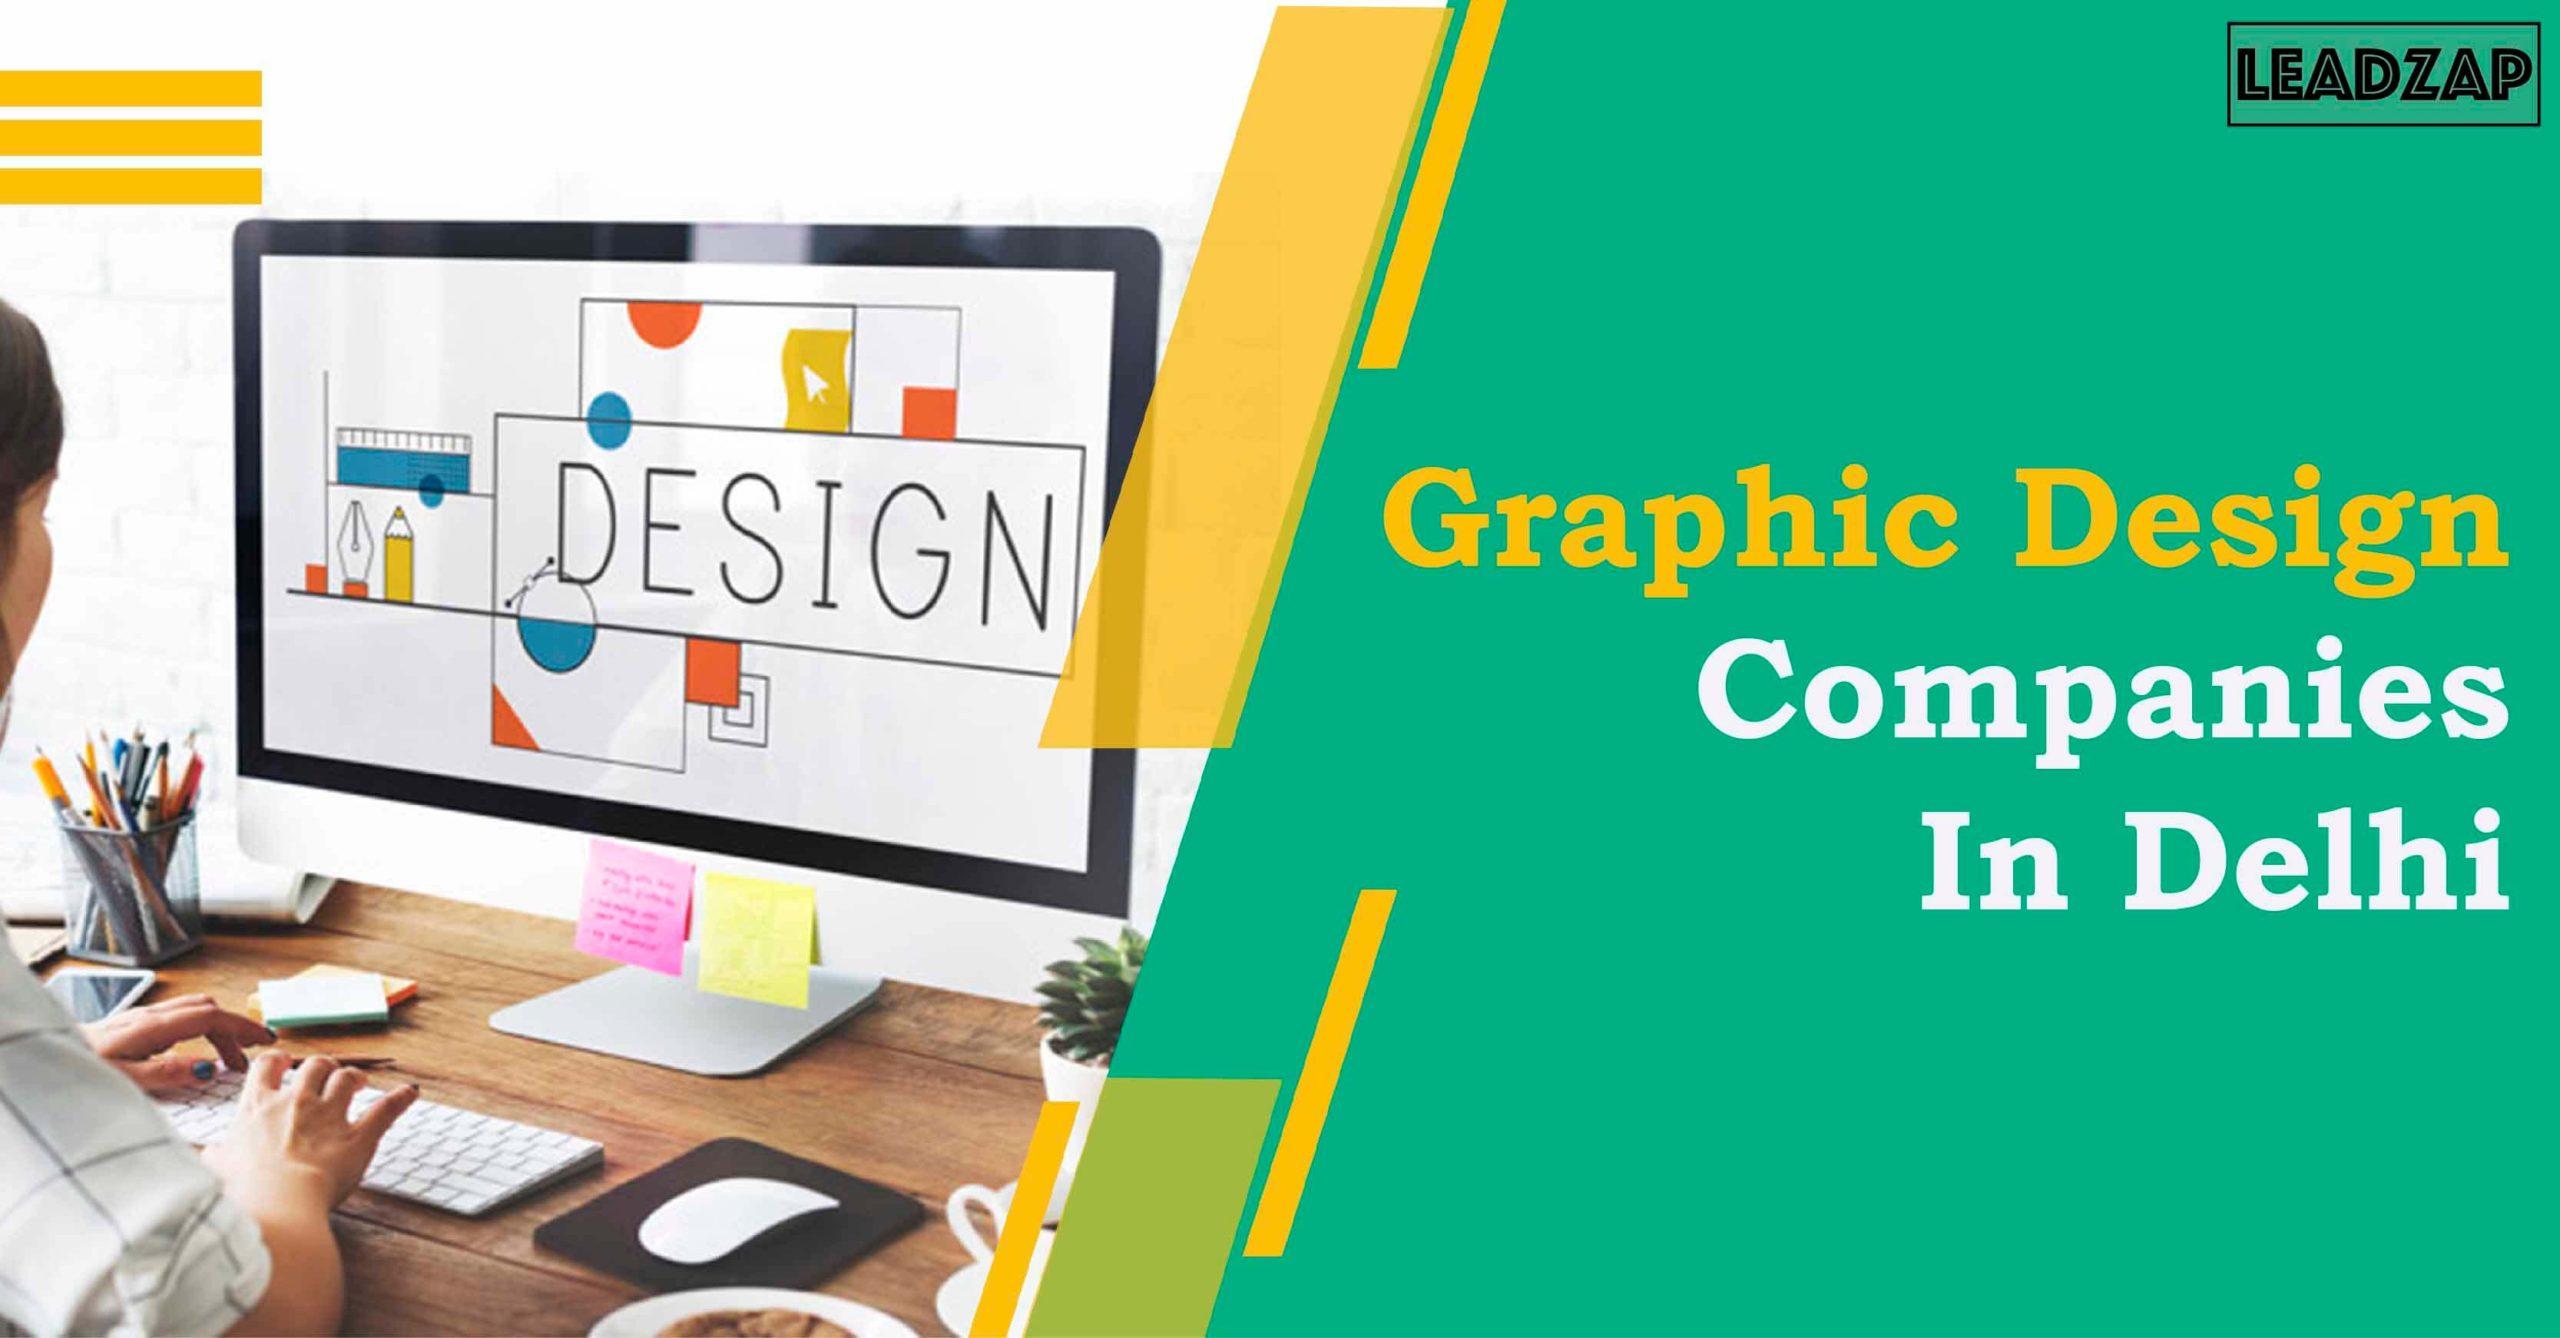 Graphic Design Companies In Delhi